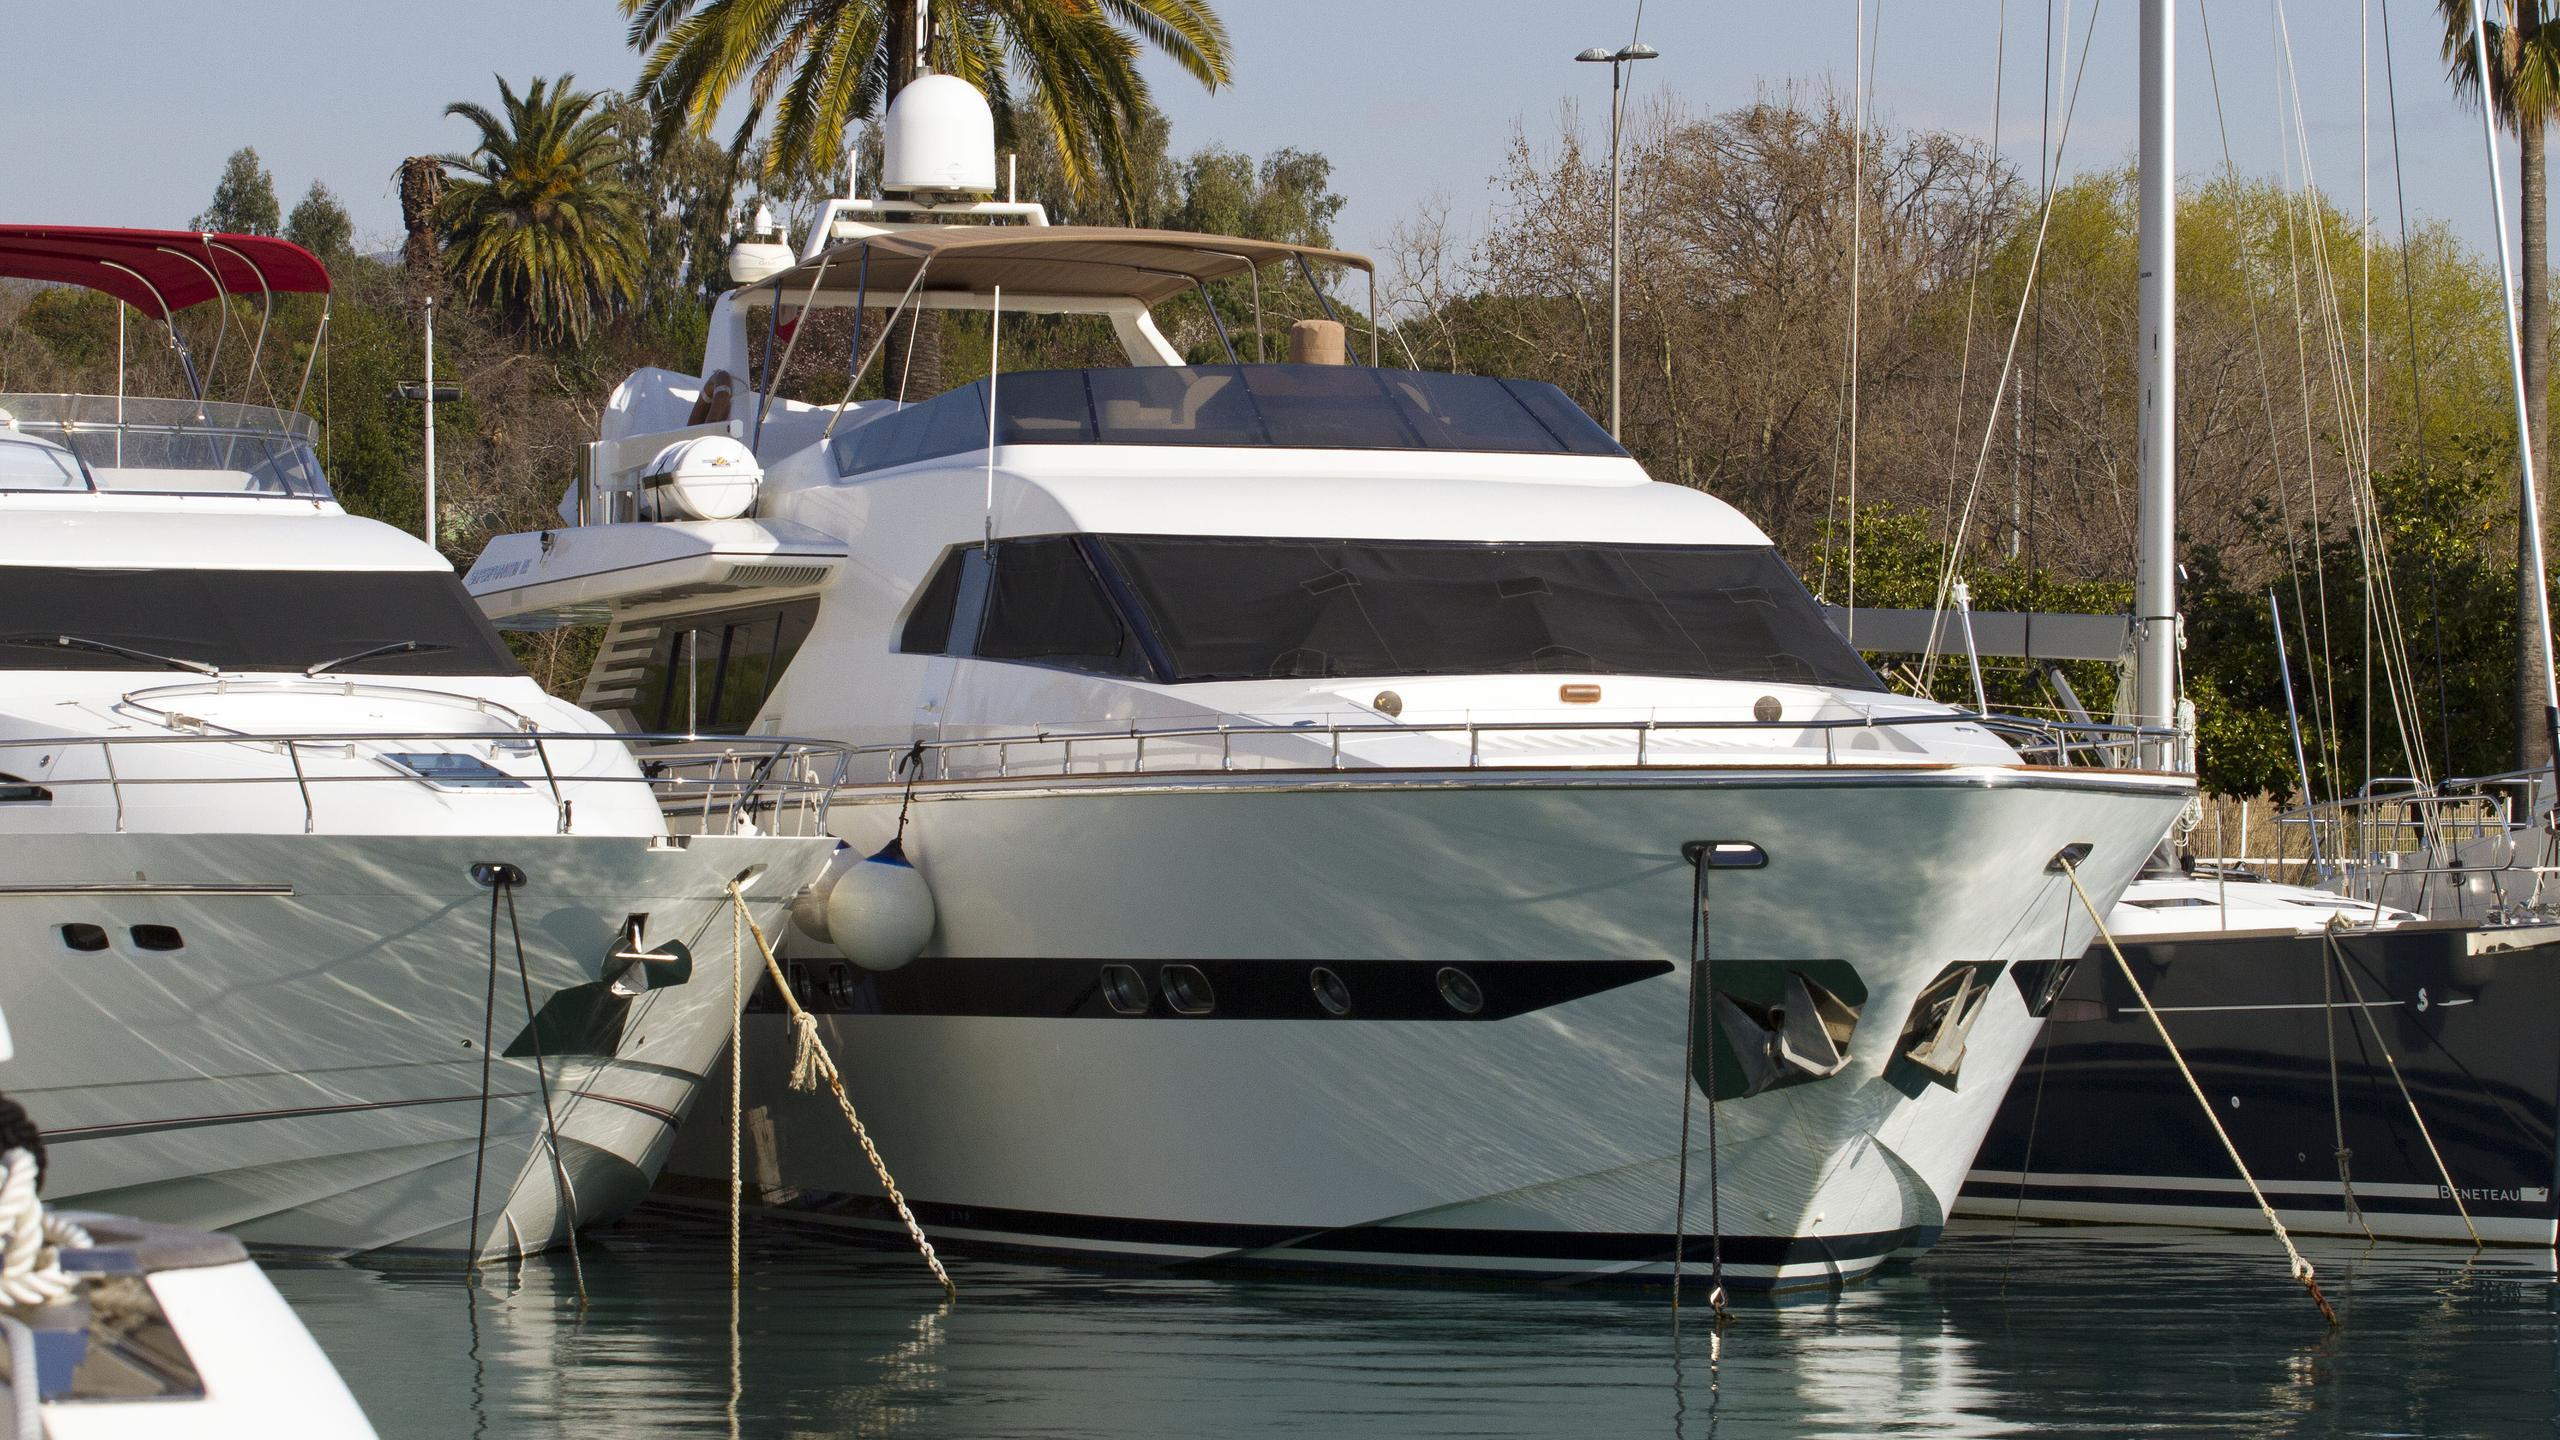 cascais-m-motor-yacht-italversil-superphantom-85-1998-26m-bow